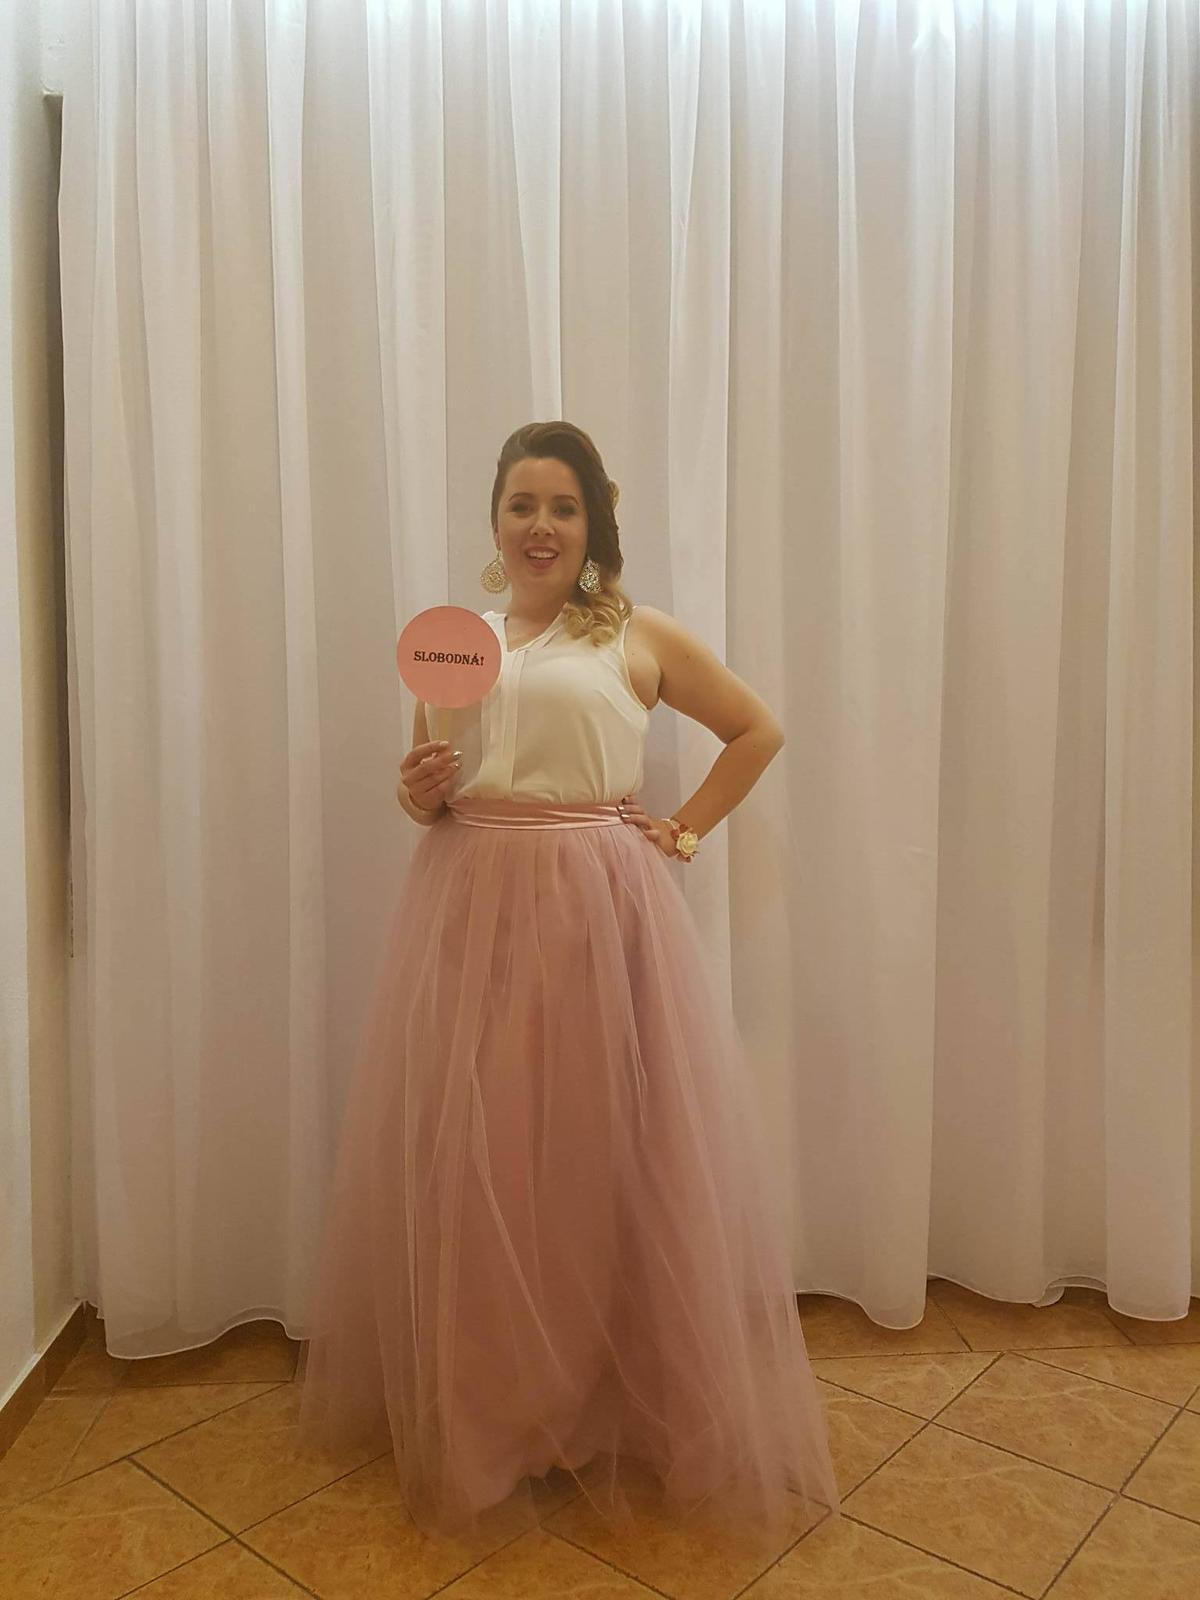 peter_a_lucia - Dlhá tylová sukňa